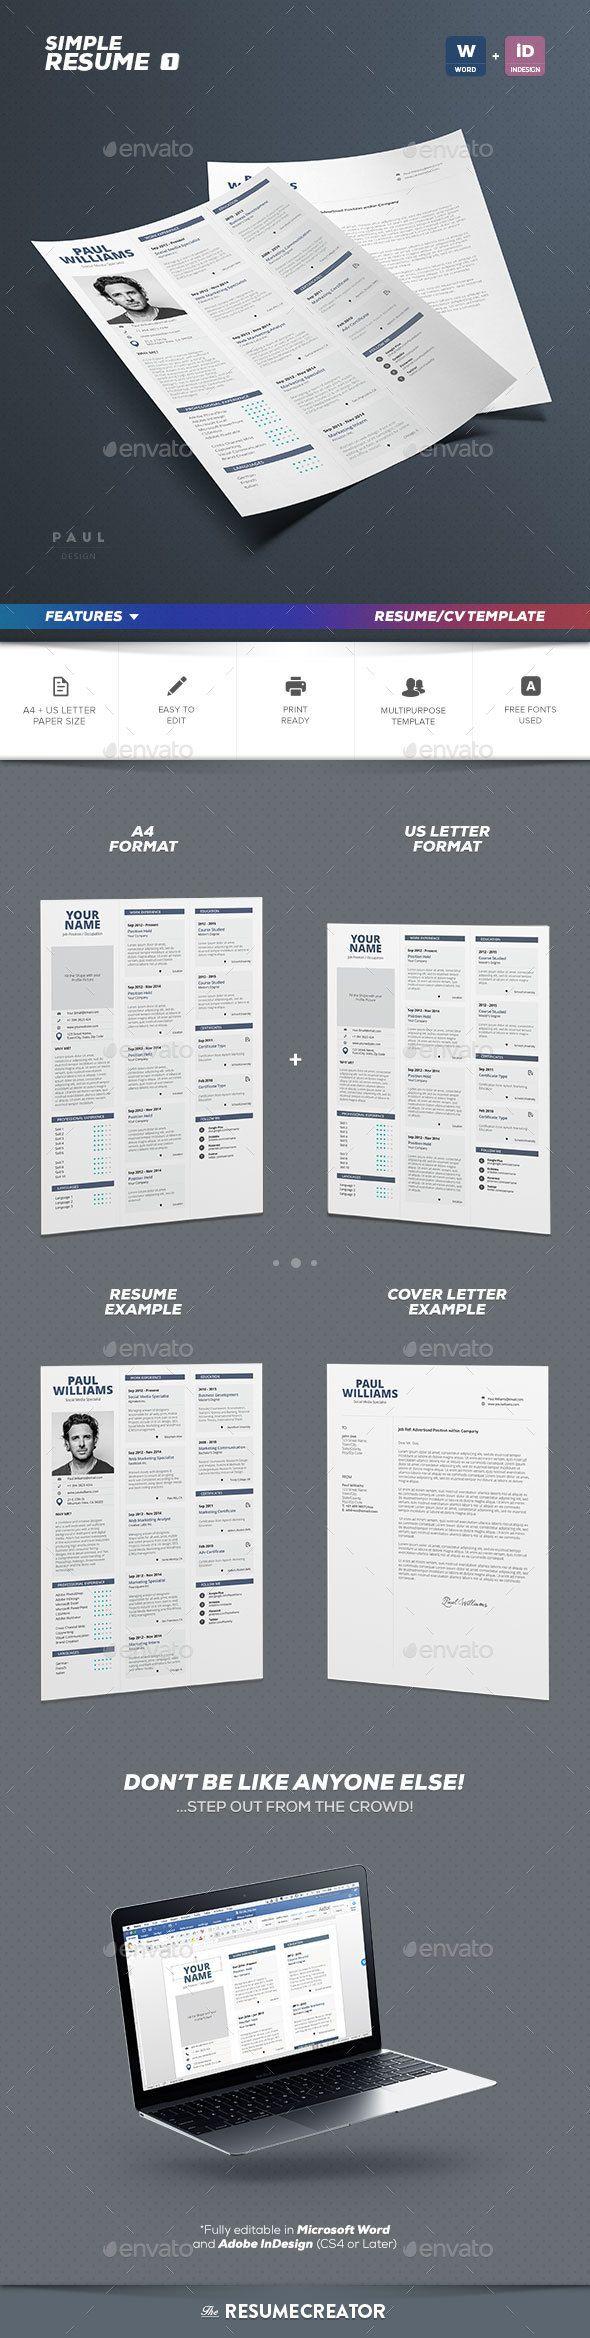 Simple Resume Vol.1 - Resumes Stationery